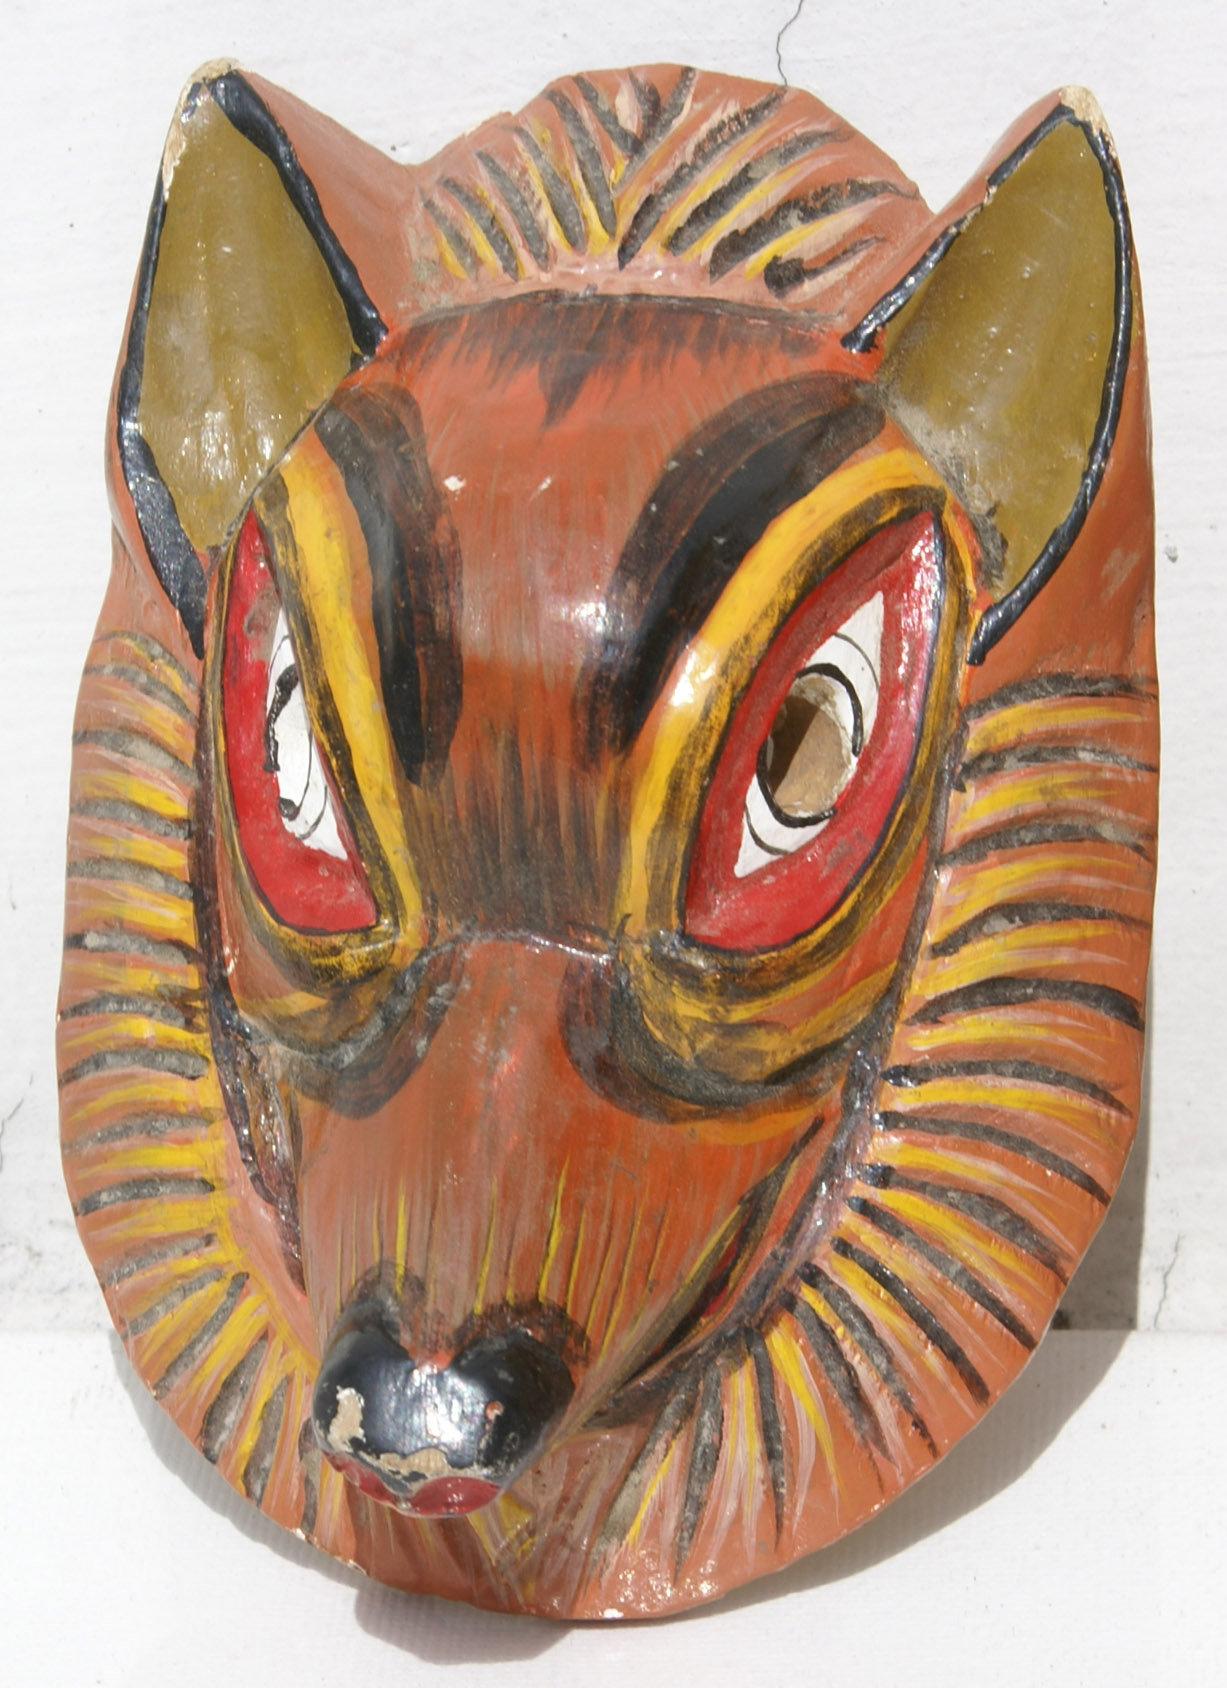 Dog Wooden Mask Handmade in Ecuador, Animal Wood Masks for ...